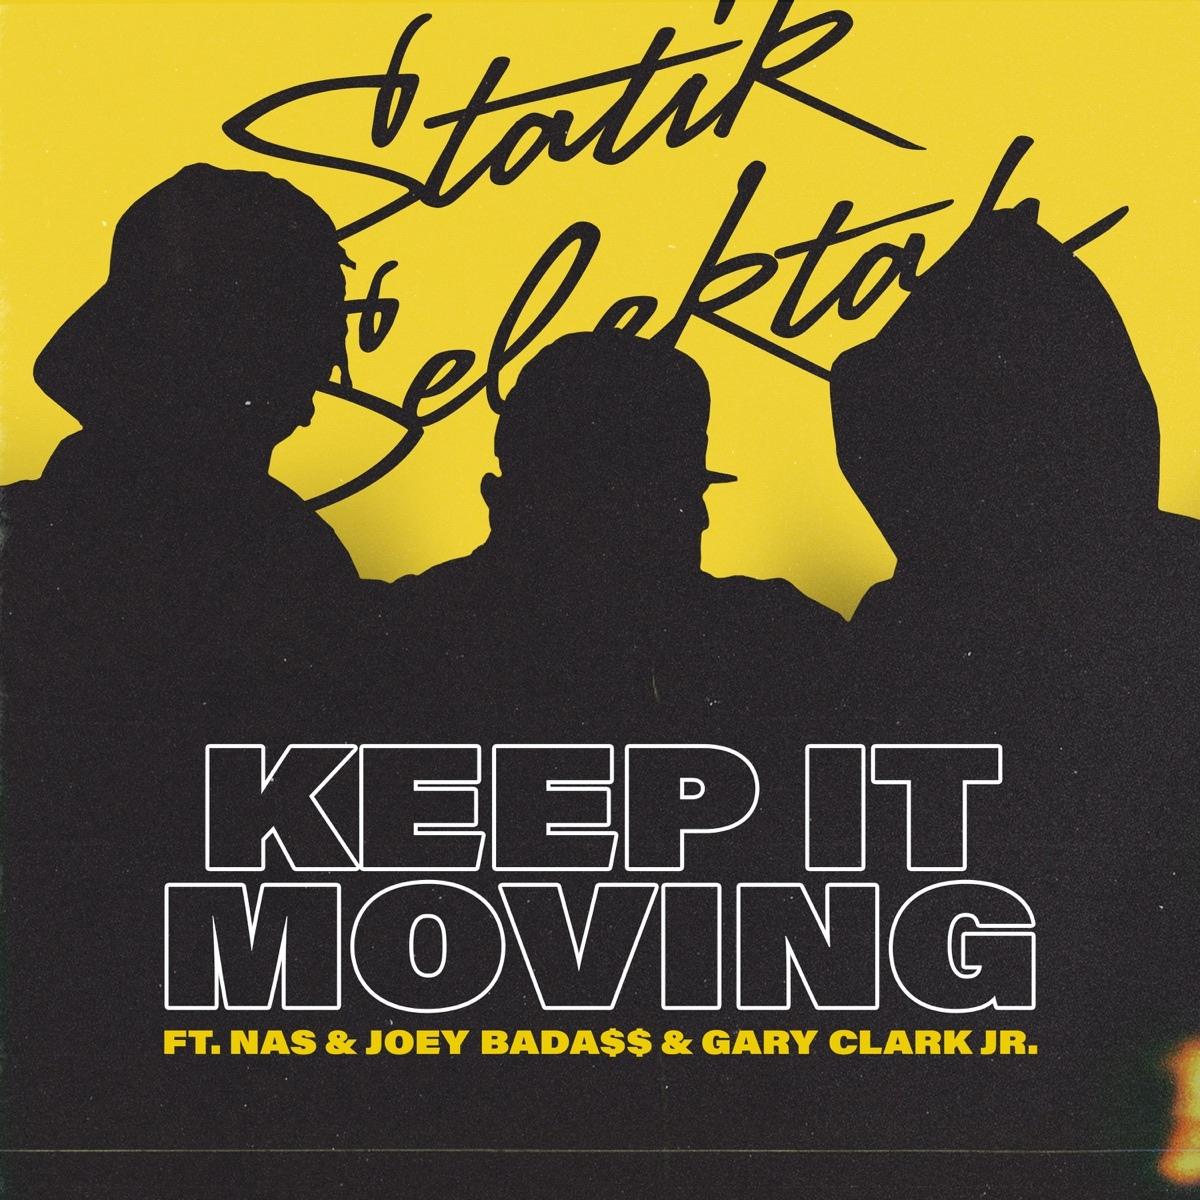 Statik Selektah — «Keep It Moving» (Feat. Nas, Joey Bada$$ & Gary Clark Jr.)